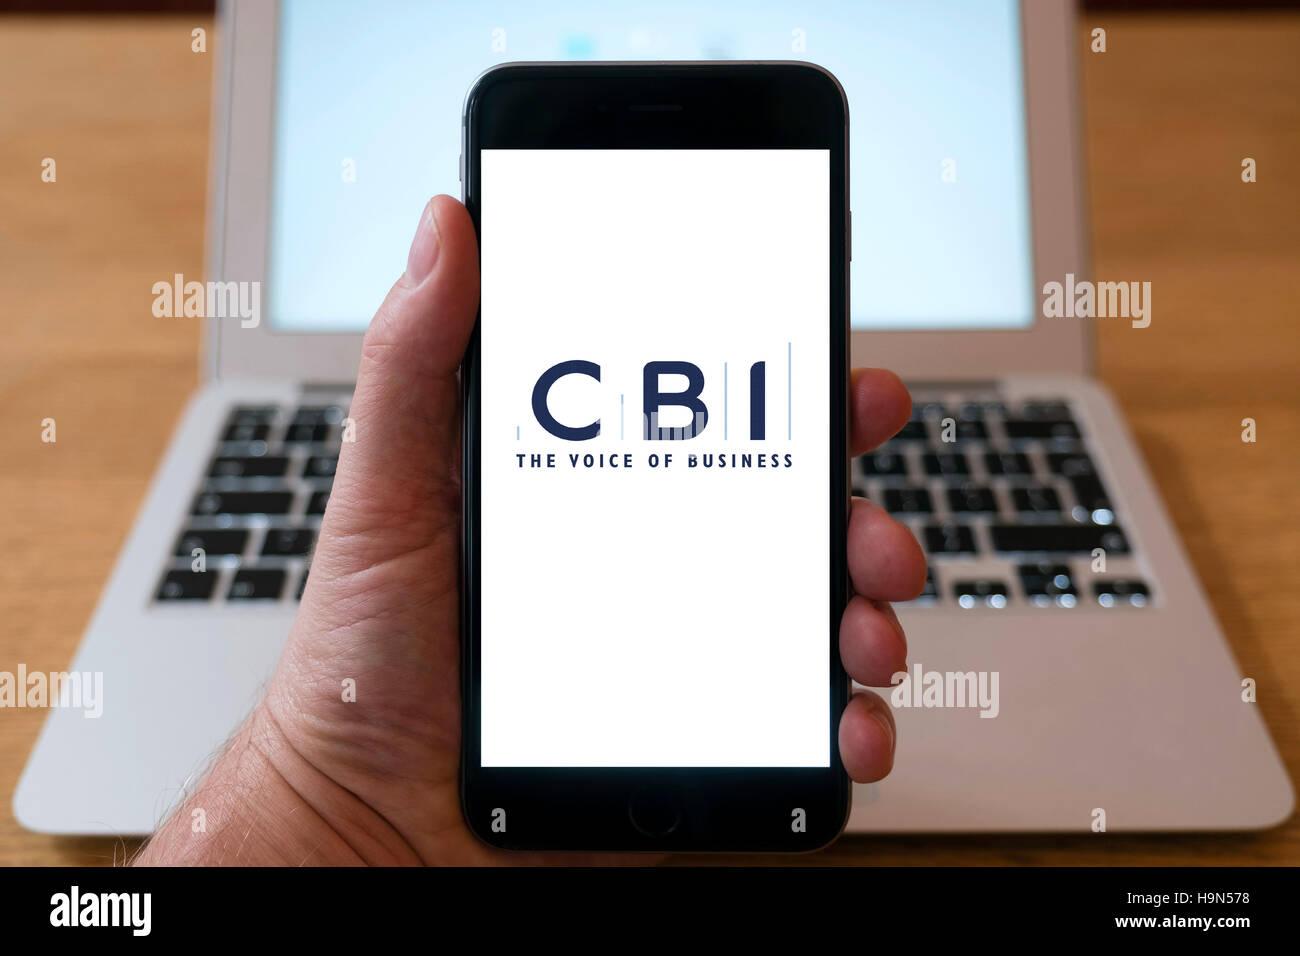 CBI business website on iPhone smart phone mobile phone - Stock Image